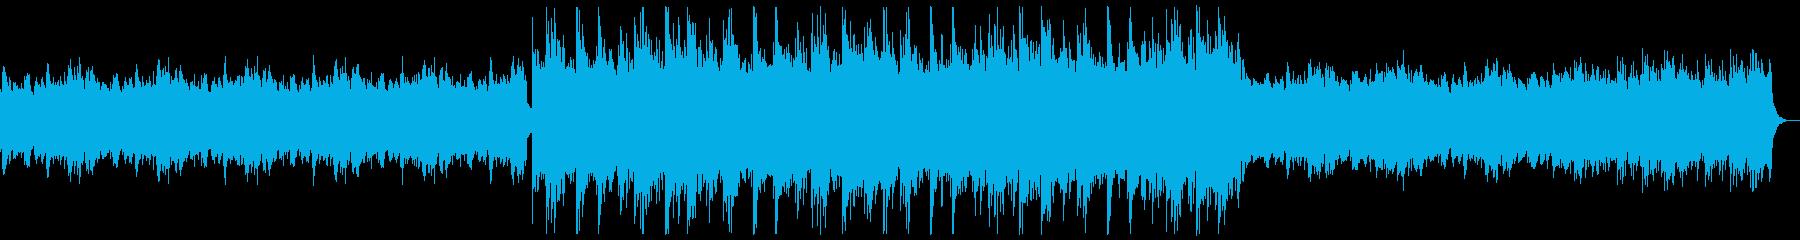 CMや映像に ピアノ、ストリングス、雄大の再生済みの波形